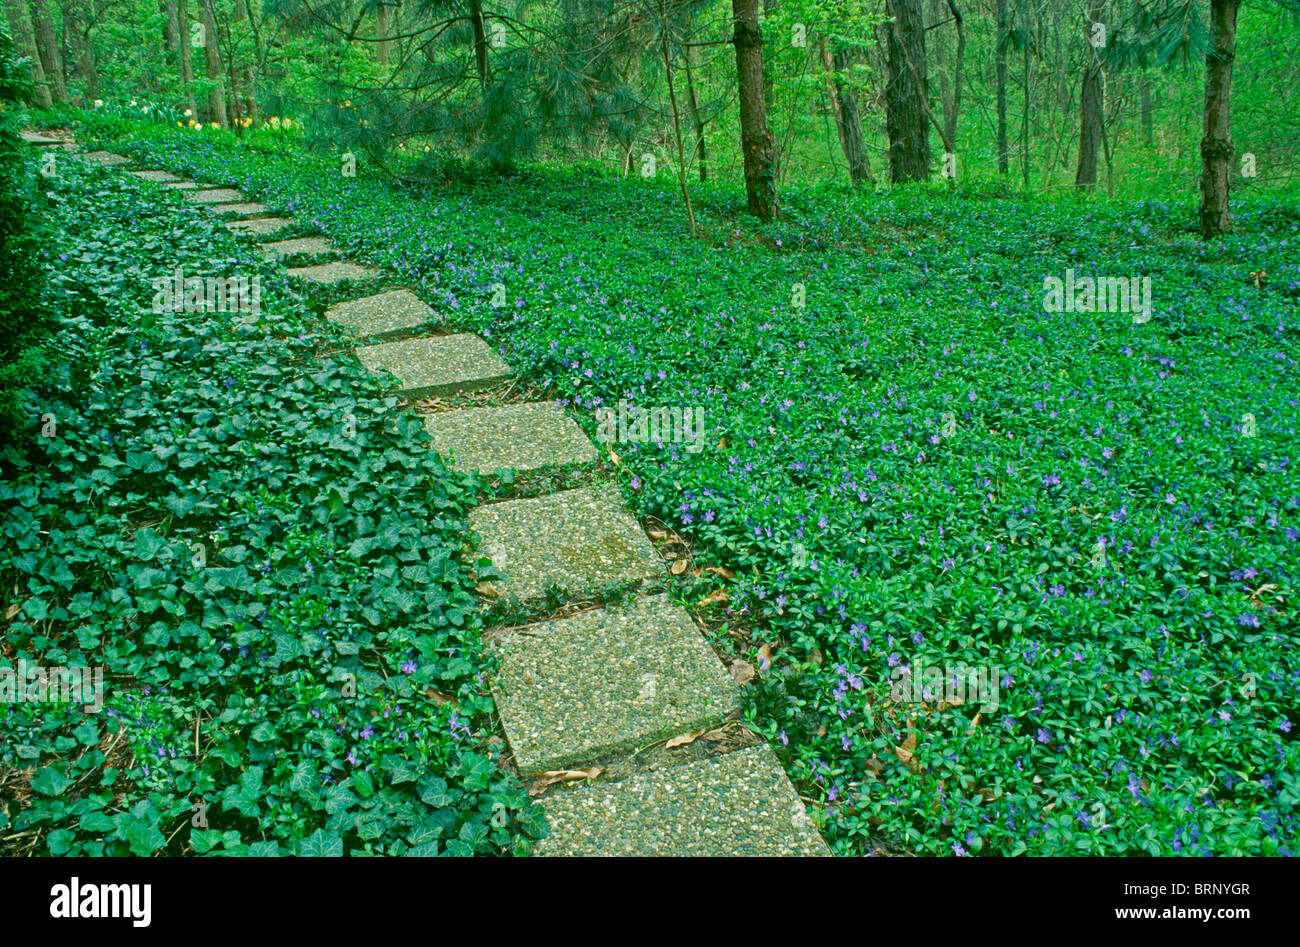 pathway through garden with a carpet of green vinca minor or stock, Natural flower